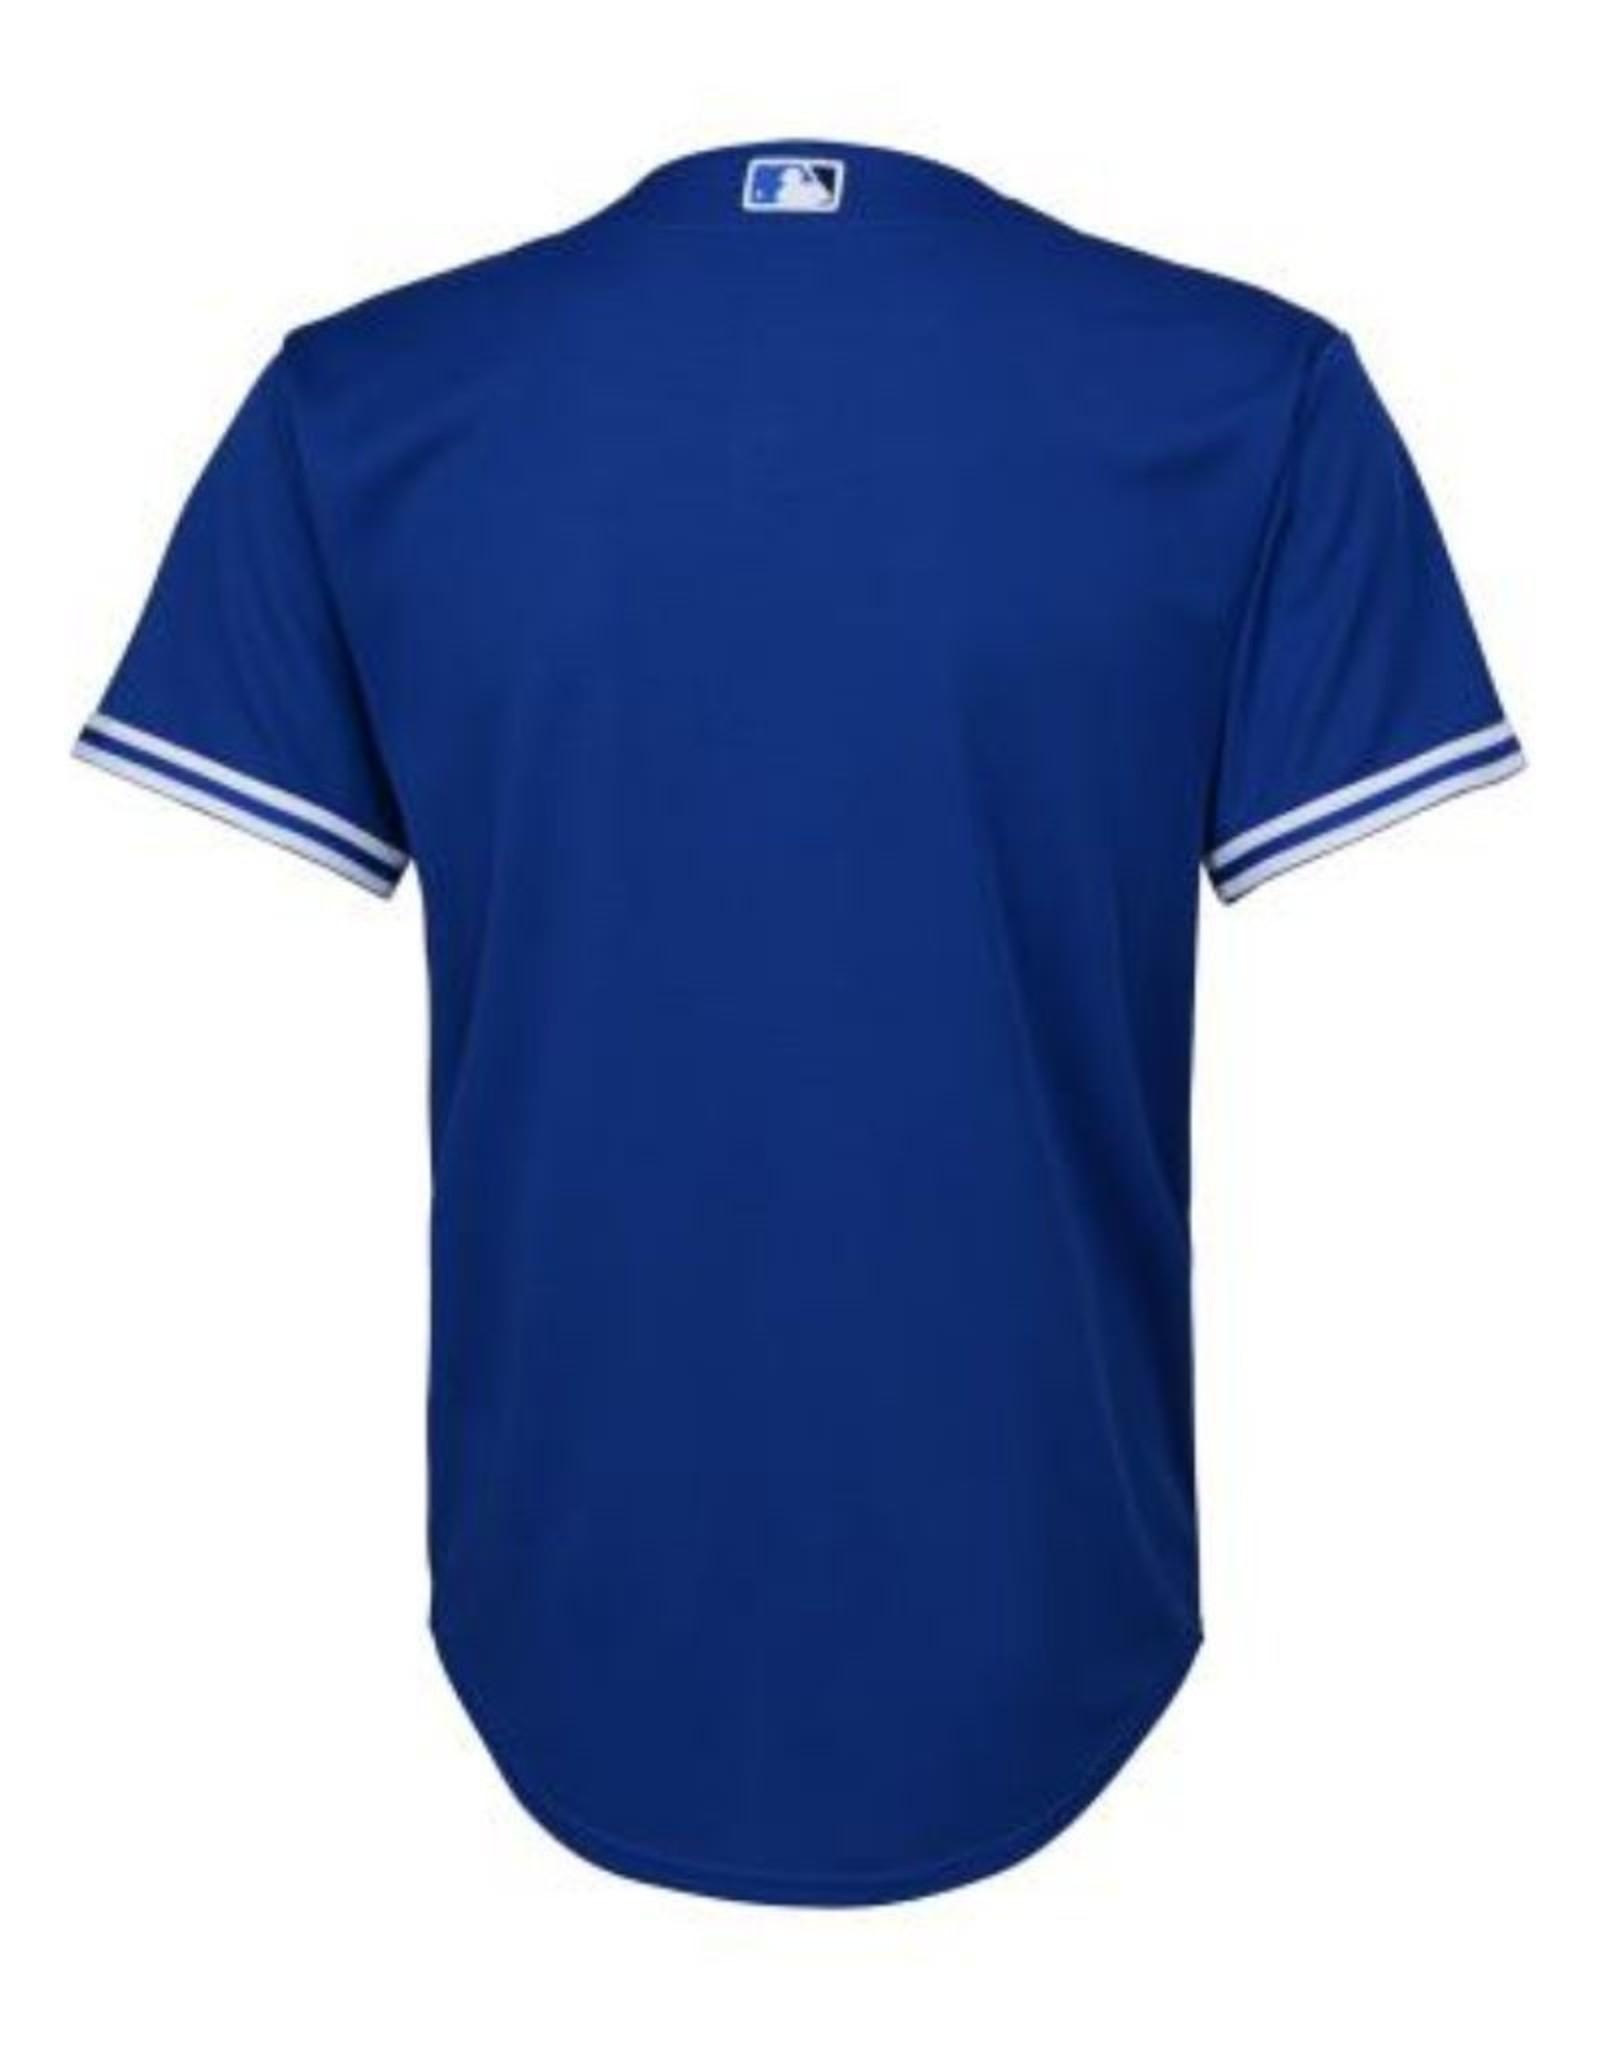 MLB Nike Youth Replica Jersey Blue Jays Blue